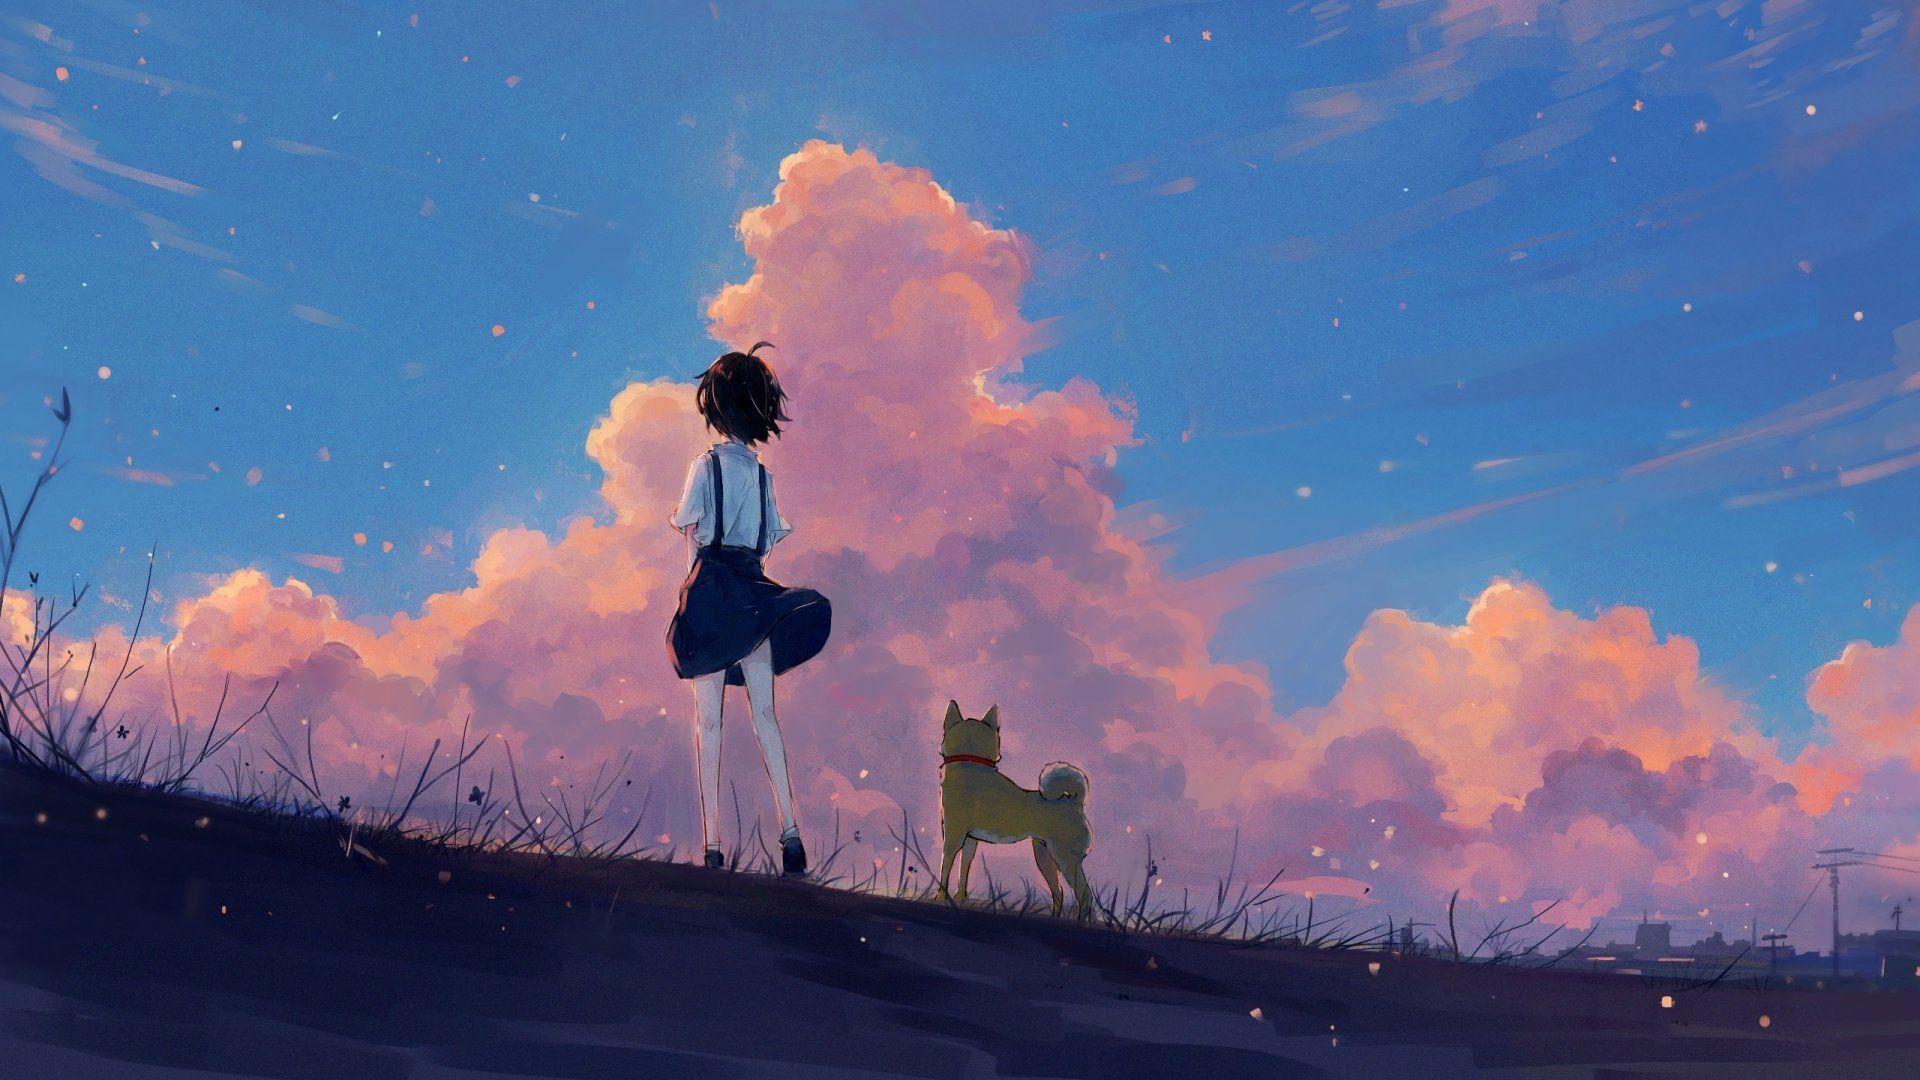 Wallpaper Abyss imagens) Anime estético, Lindas